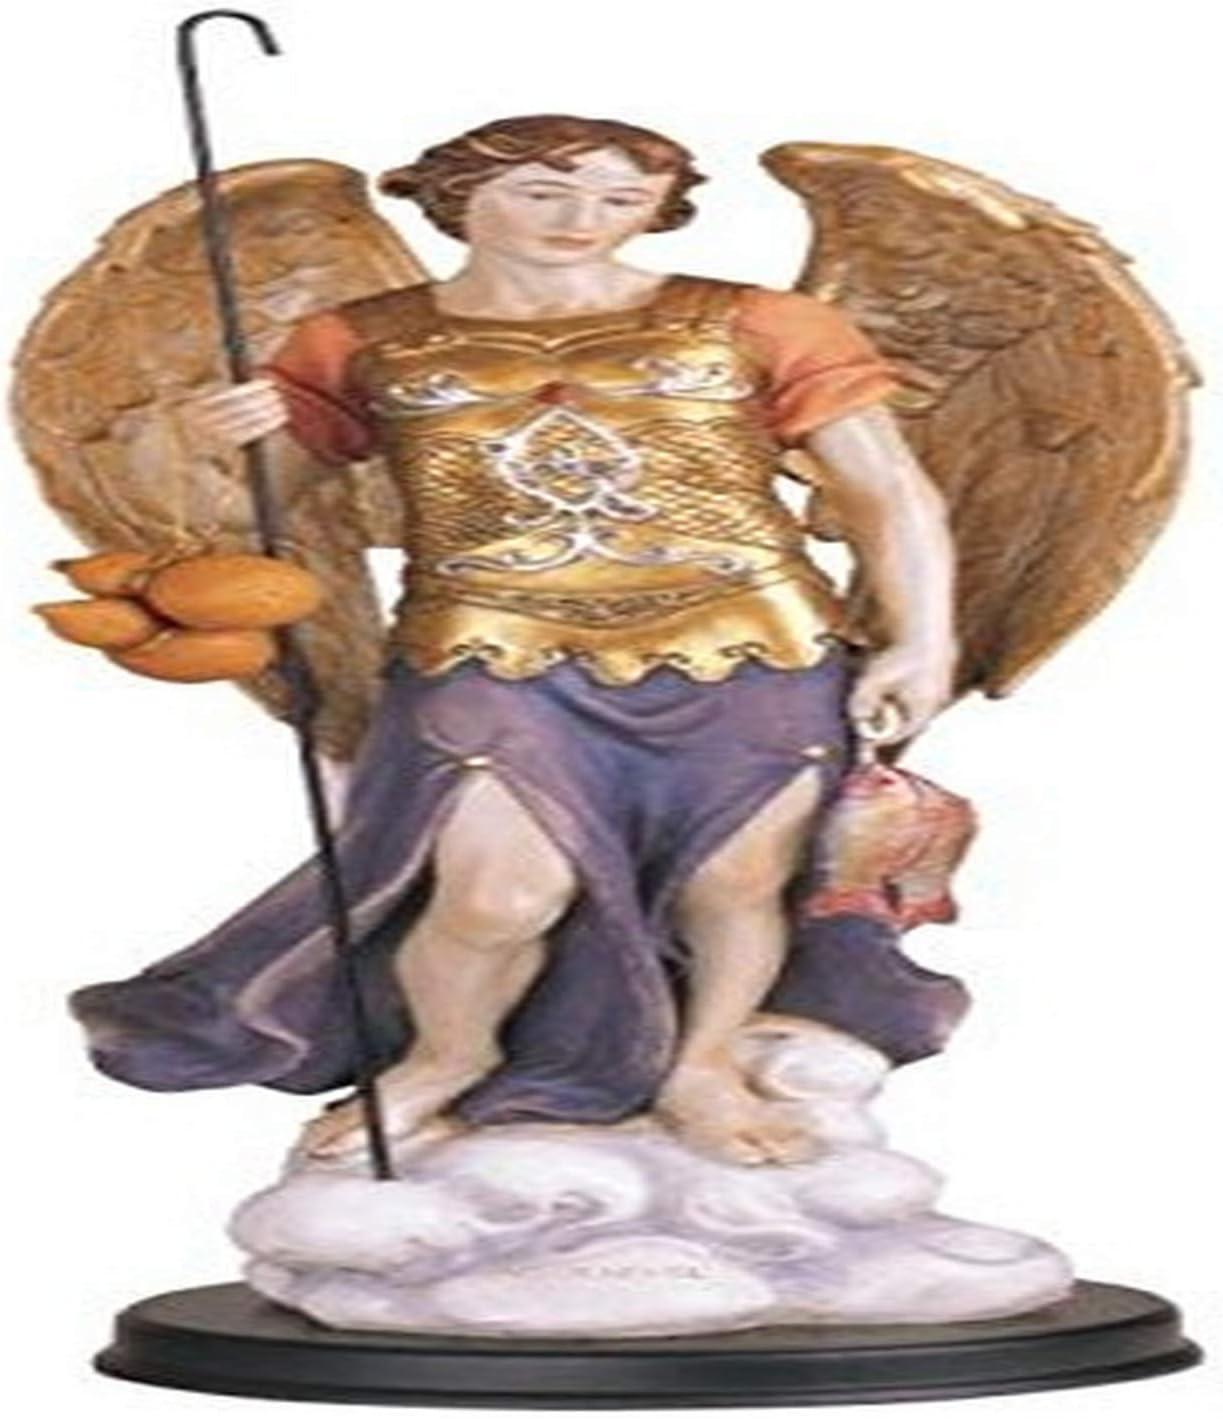 Archangel Raphael Resin Statue Religious Figurine Sculpture Ornament